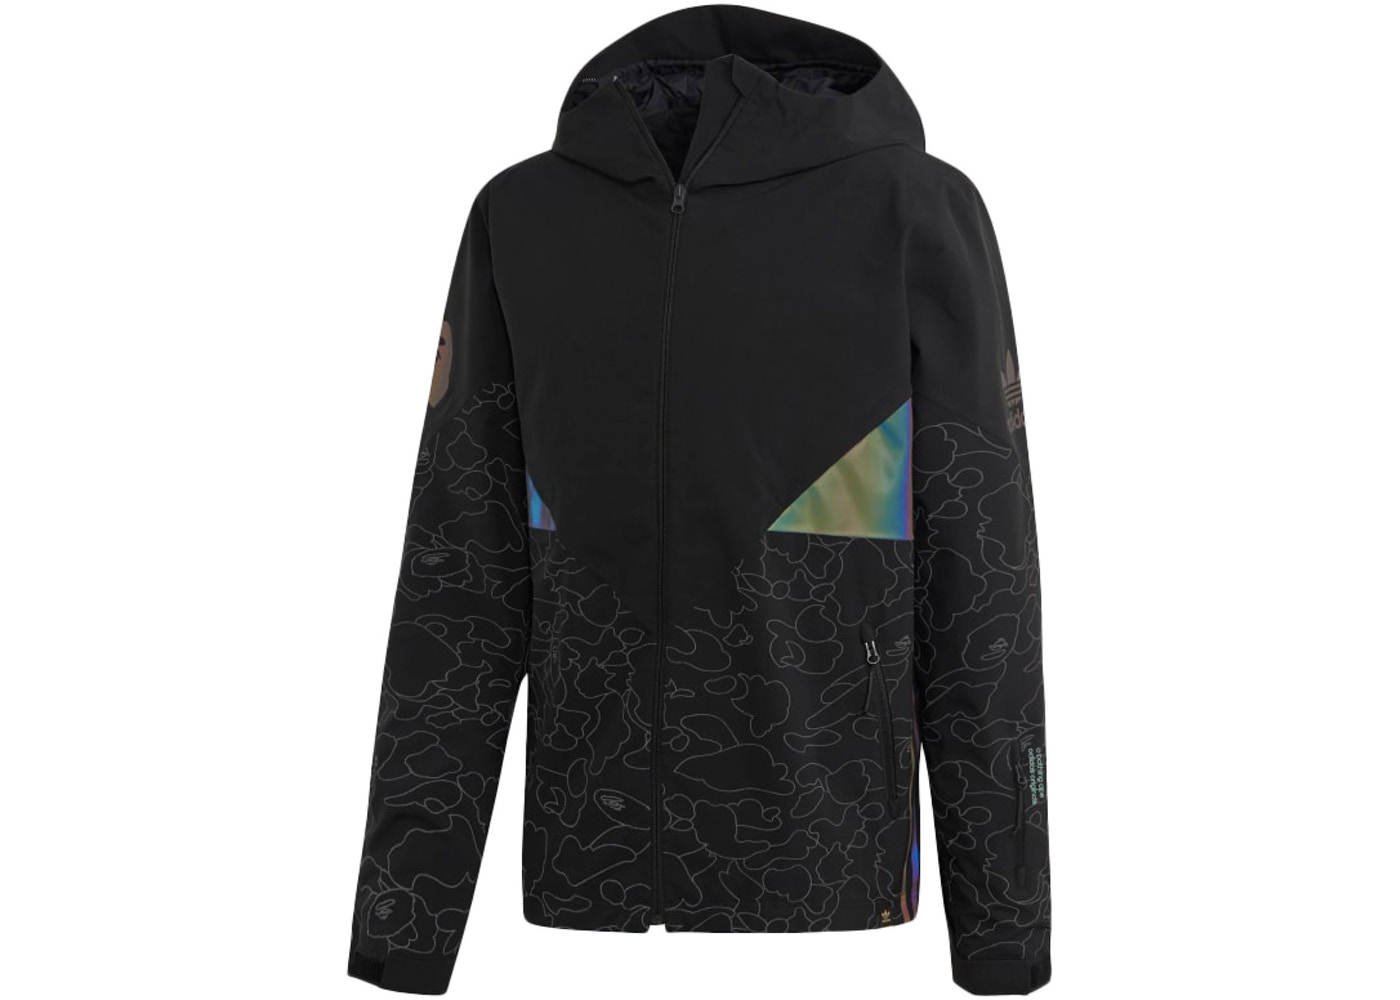 8a1284ae Bape Jackets - Buy & Sell Streetwear